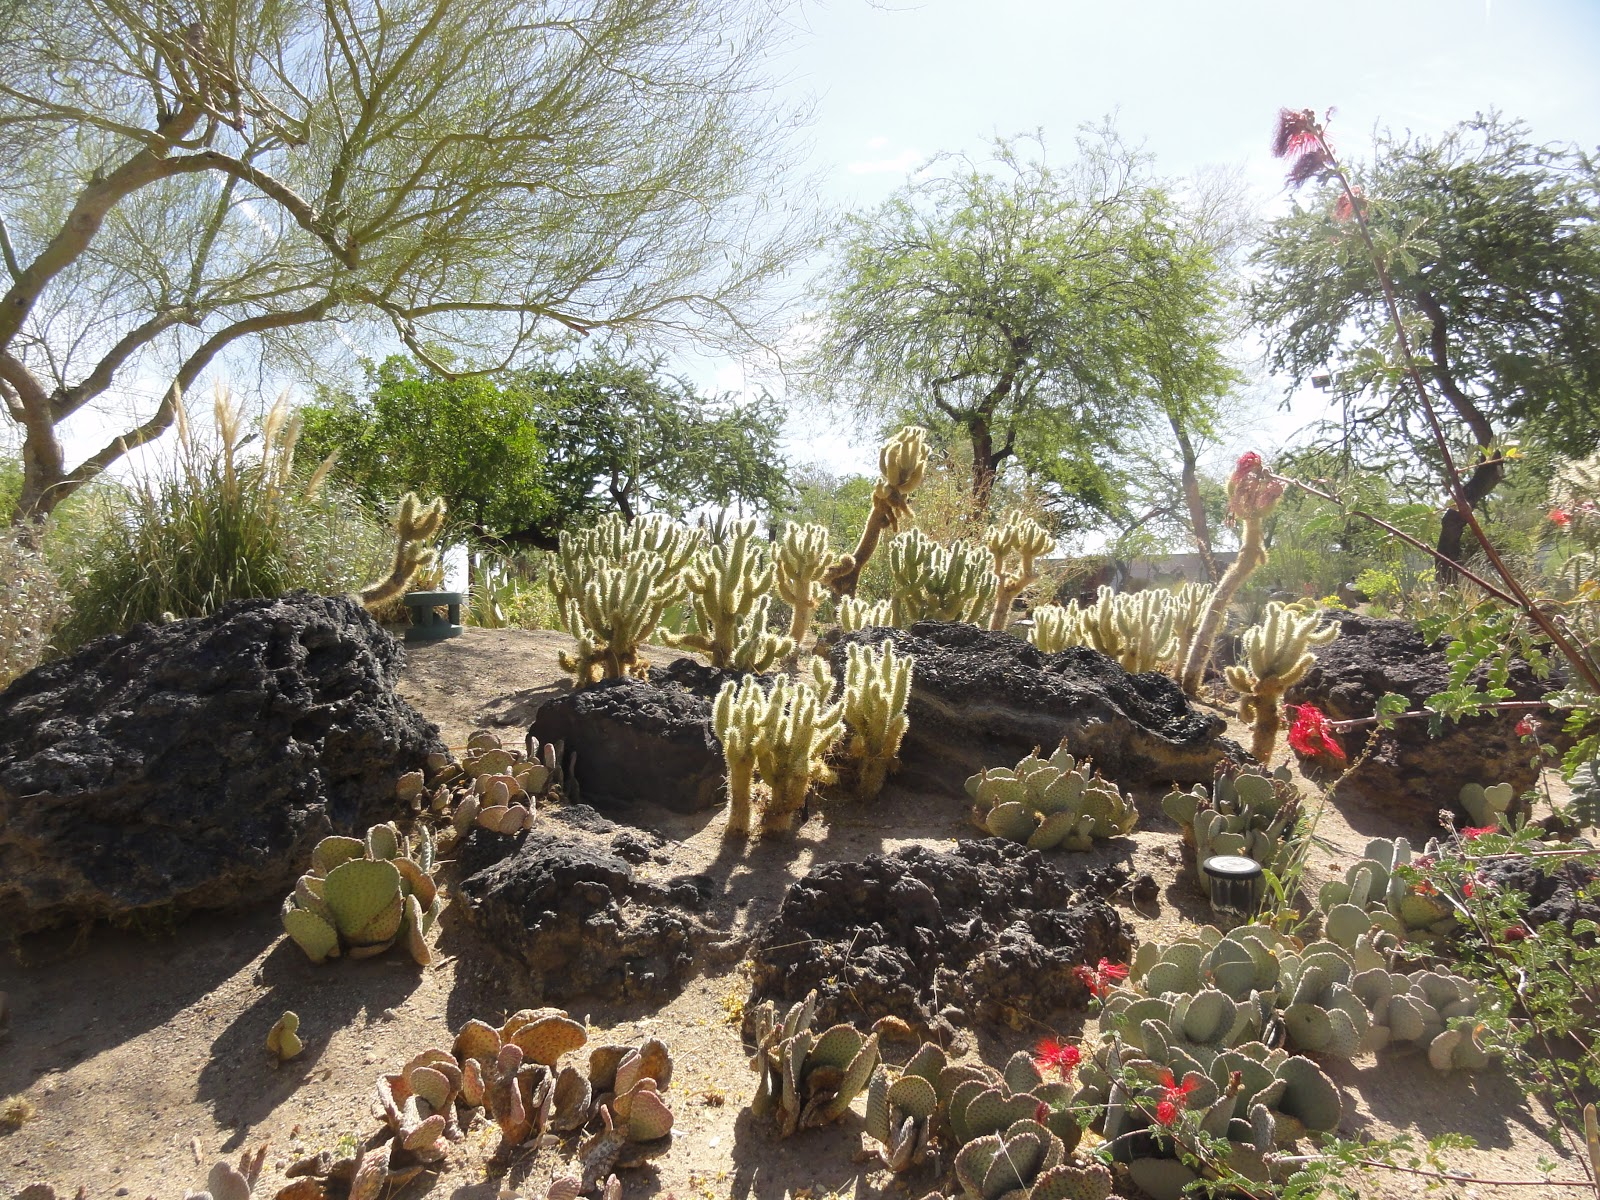 Gogardennow The Gardening Blog Ethel M S Chocolate Factory And Cactus Garden